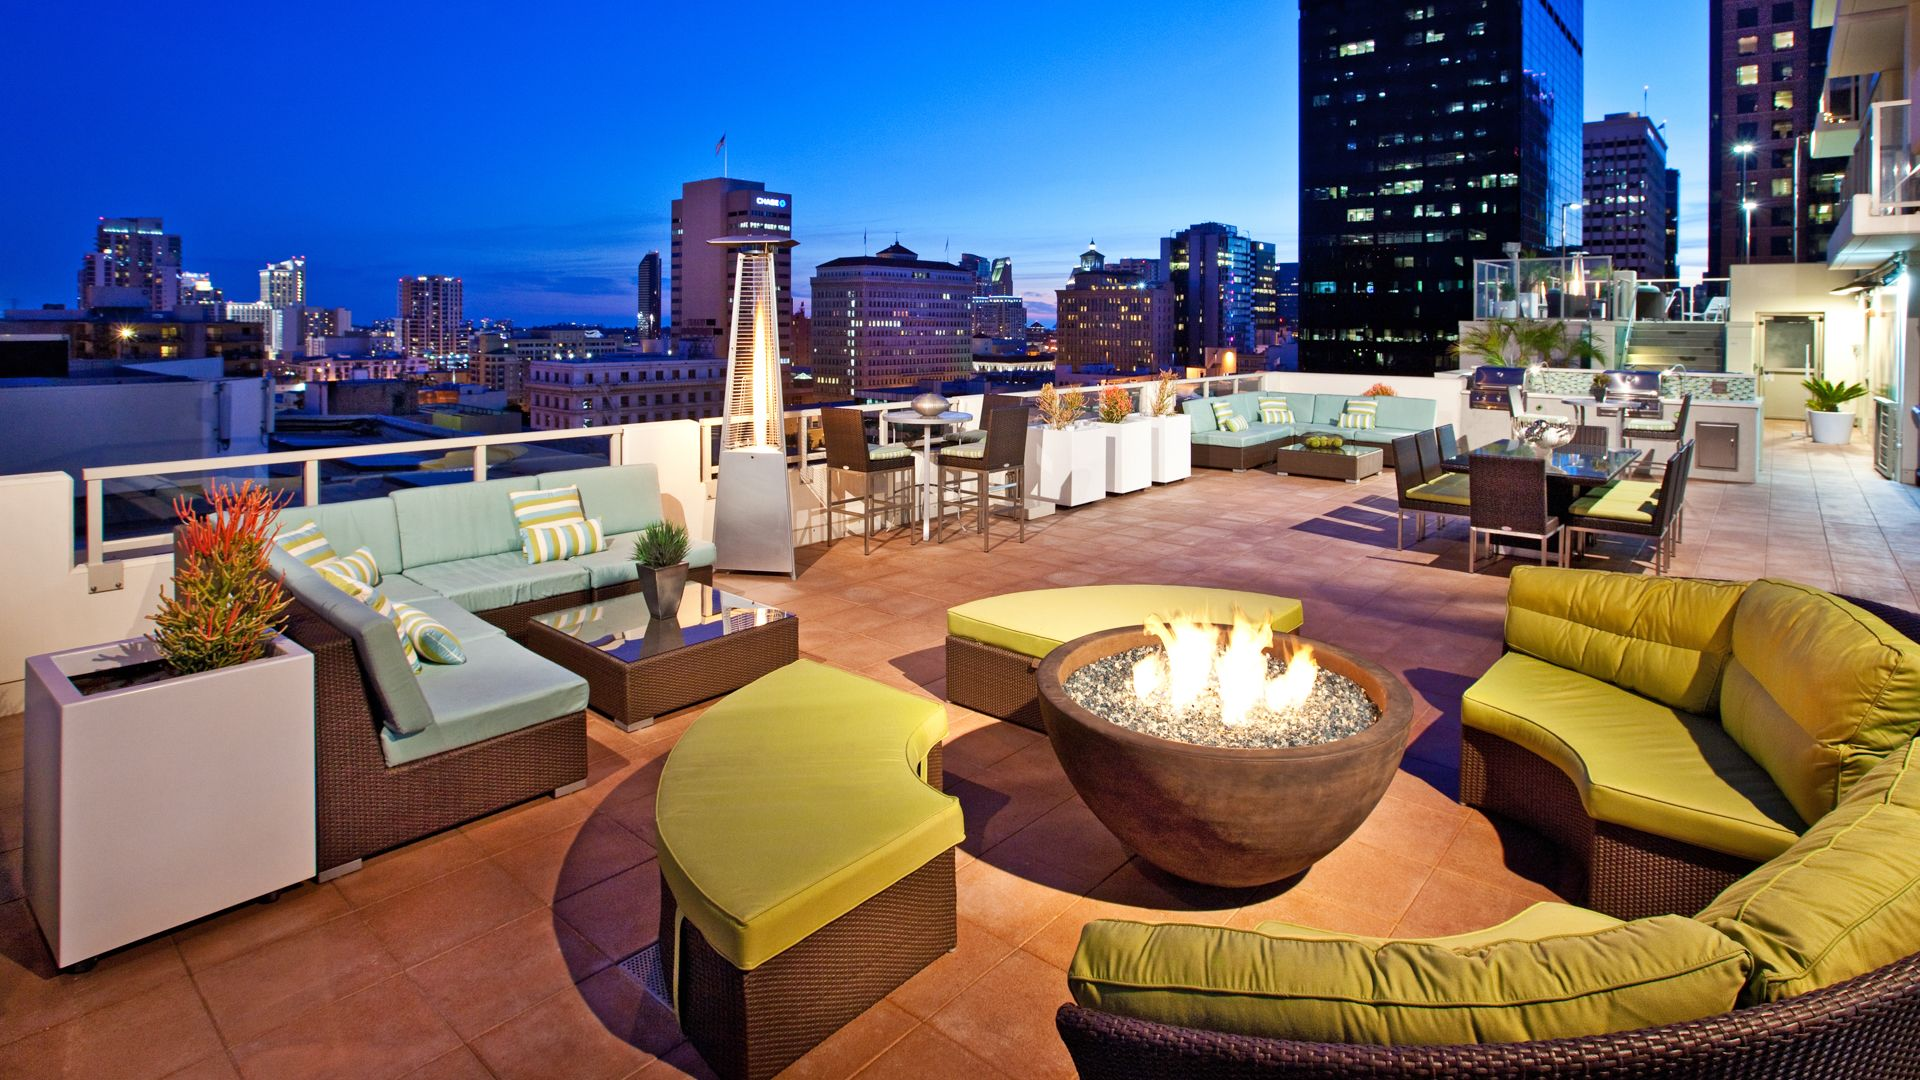 Vantage Pointe Apartments - Rooftop Deck